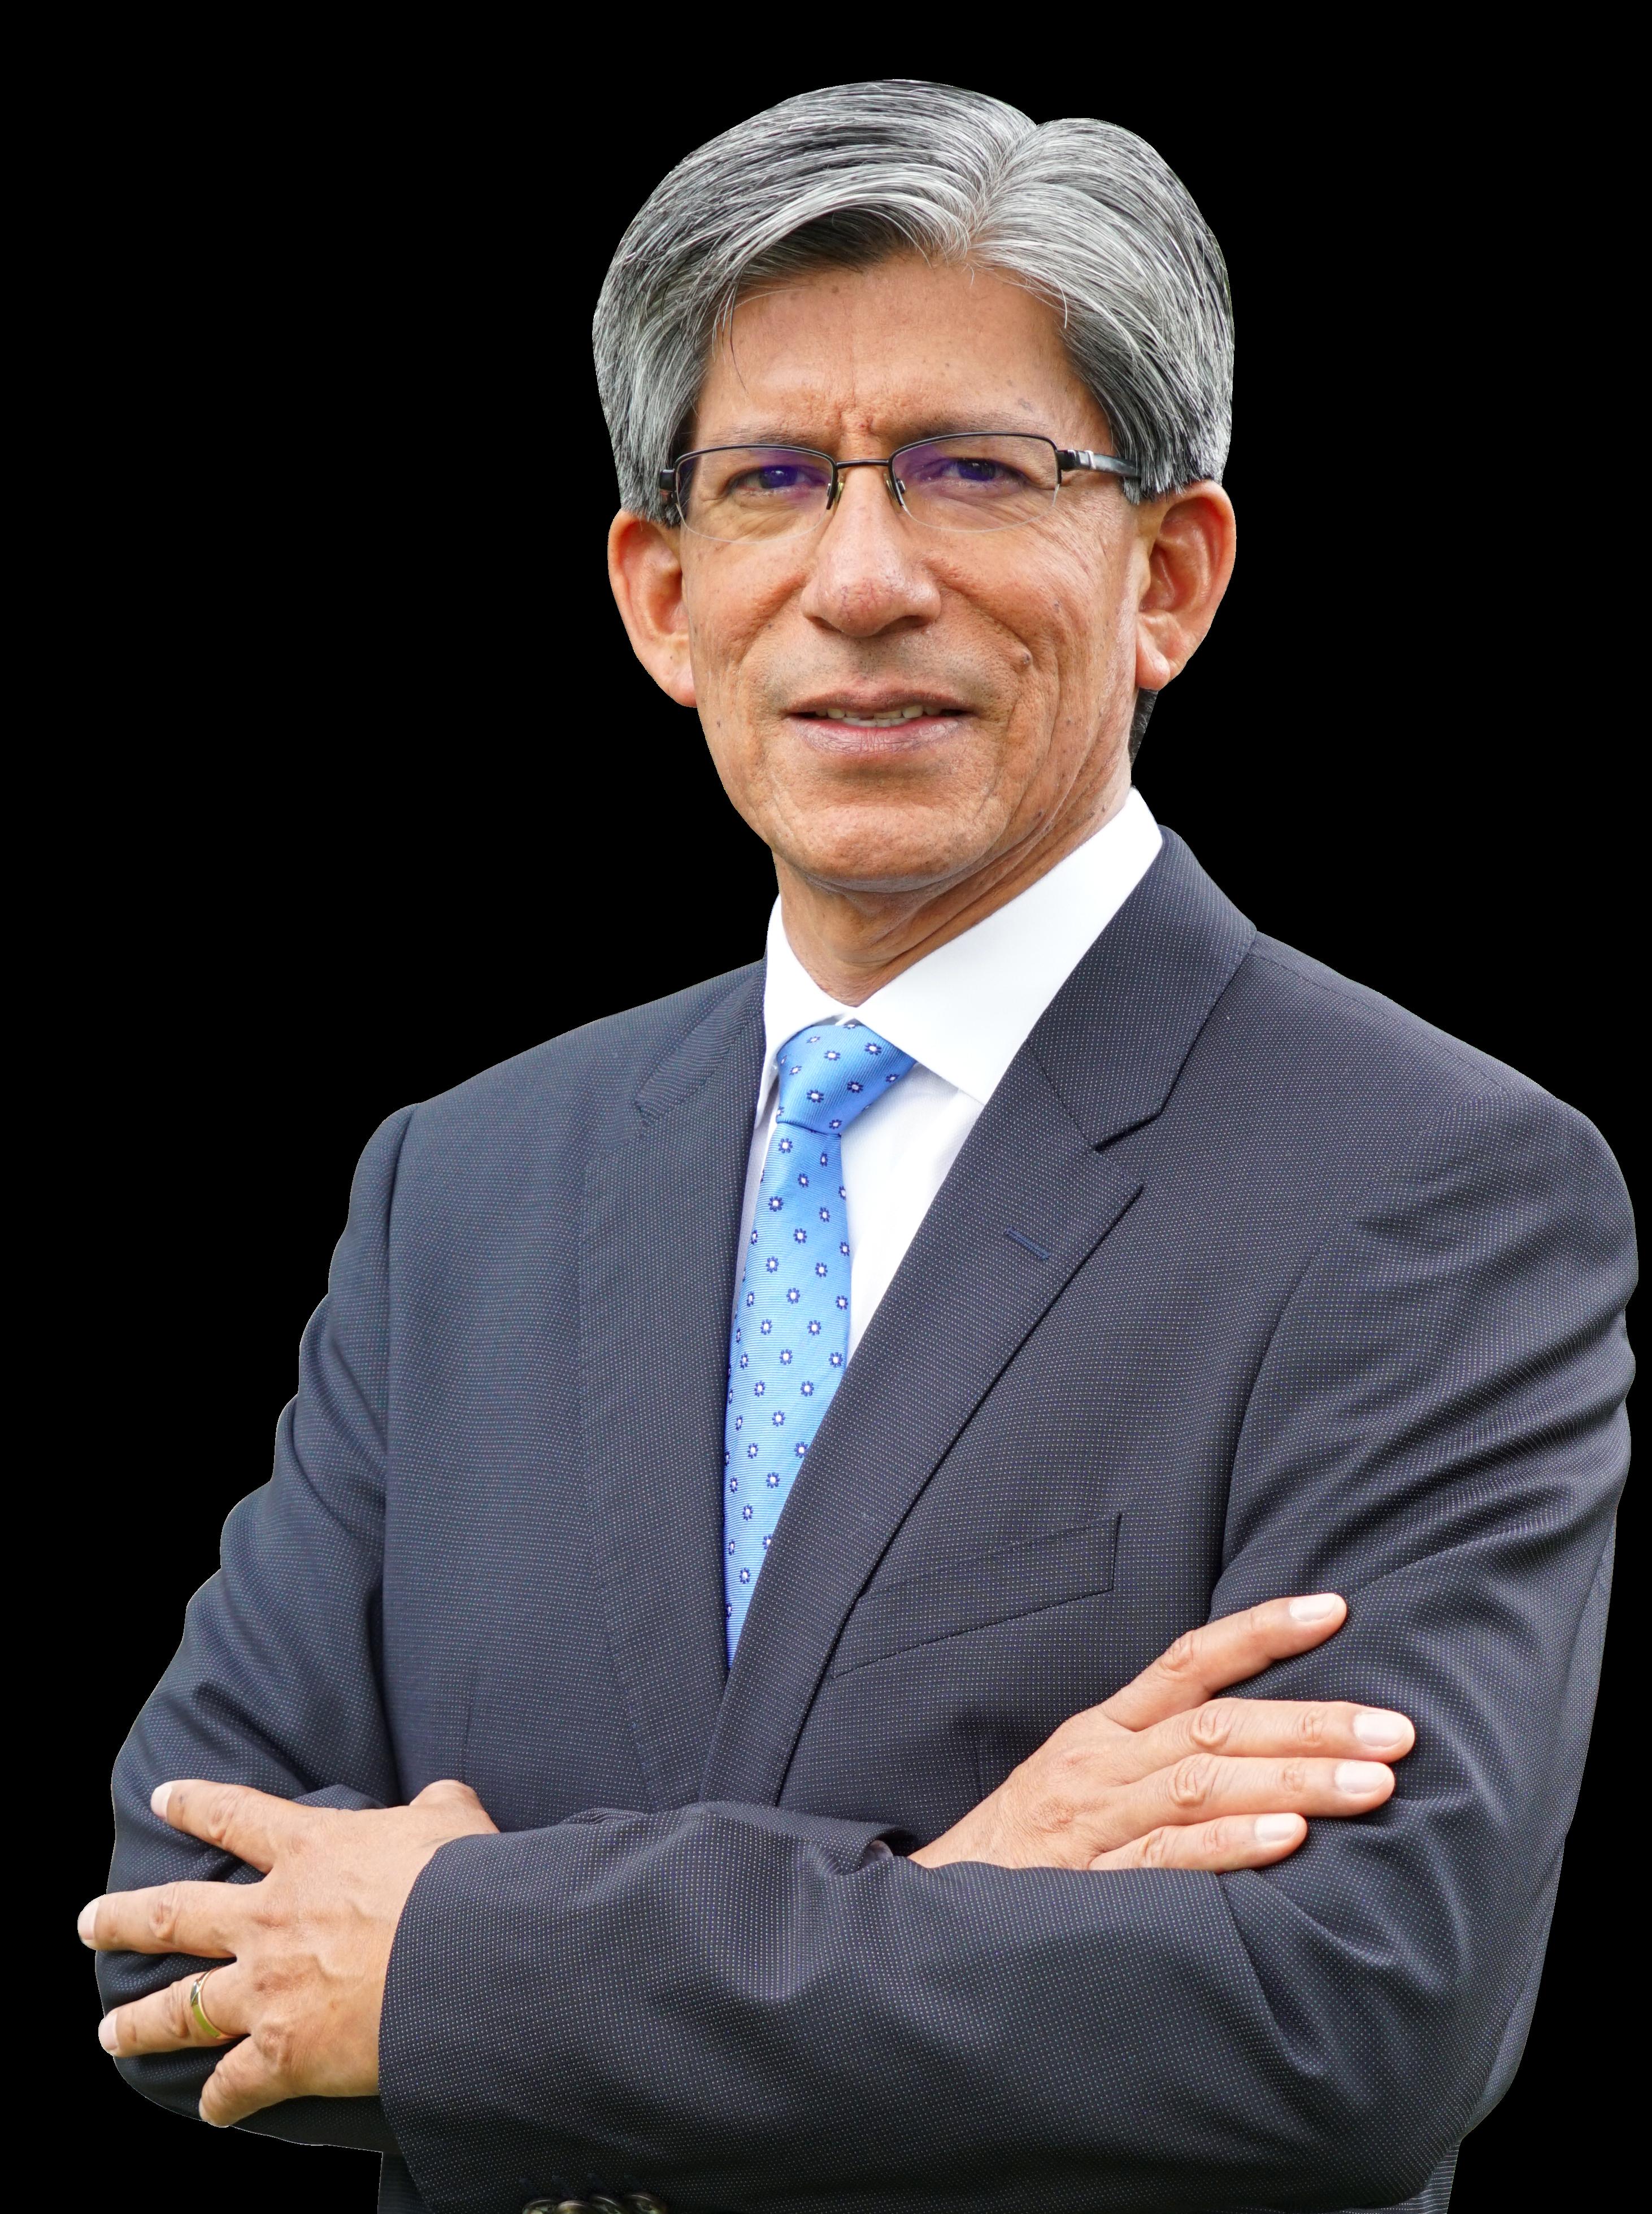 Guillermo Lecarnaque